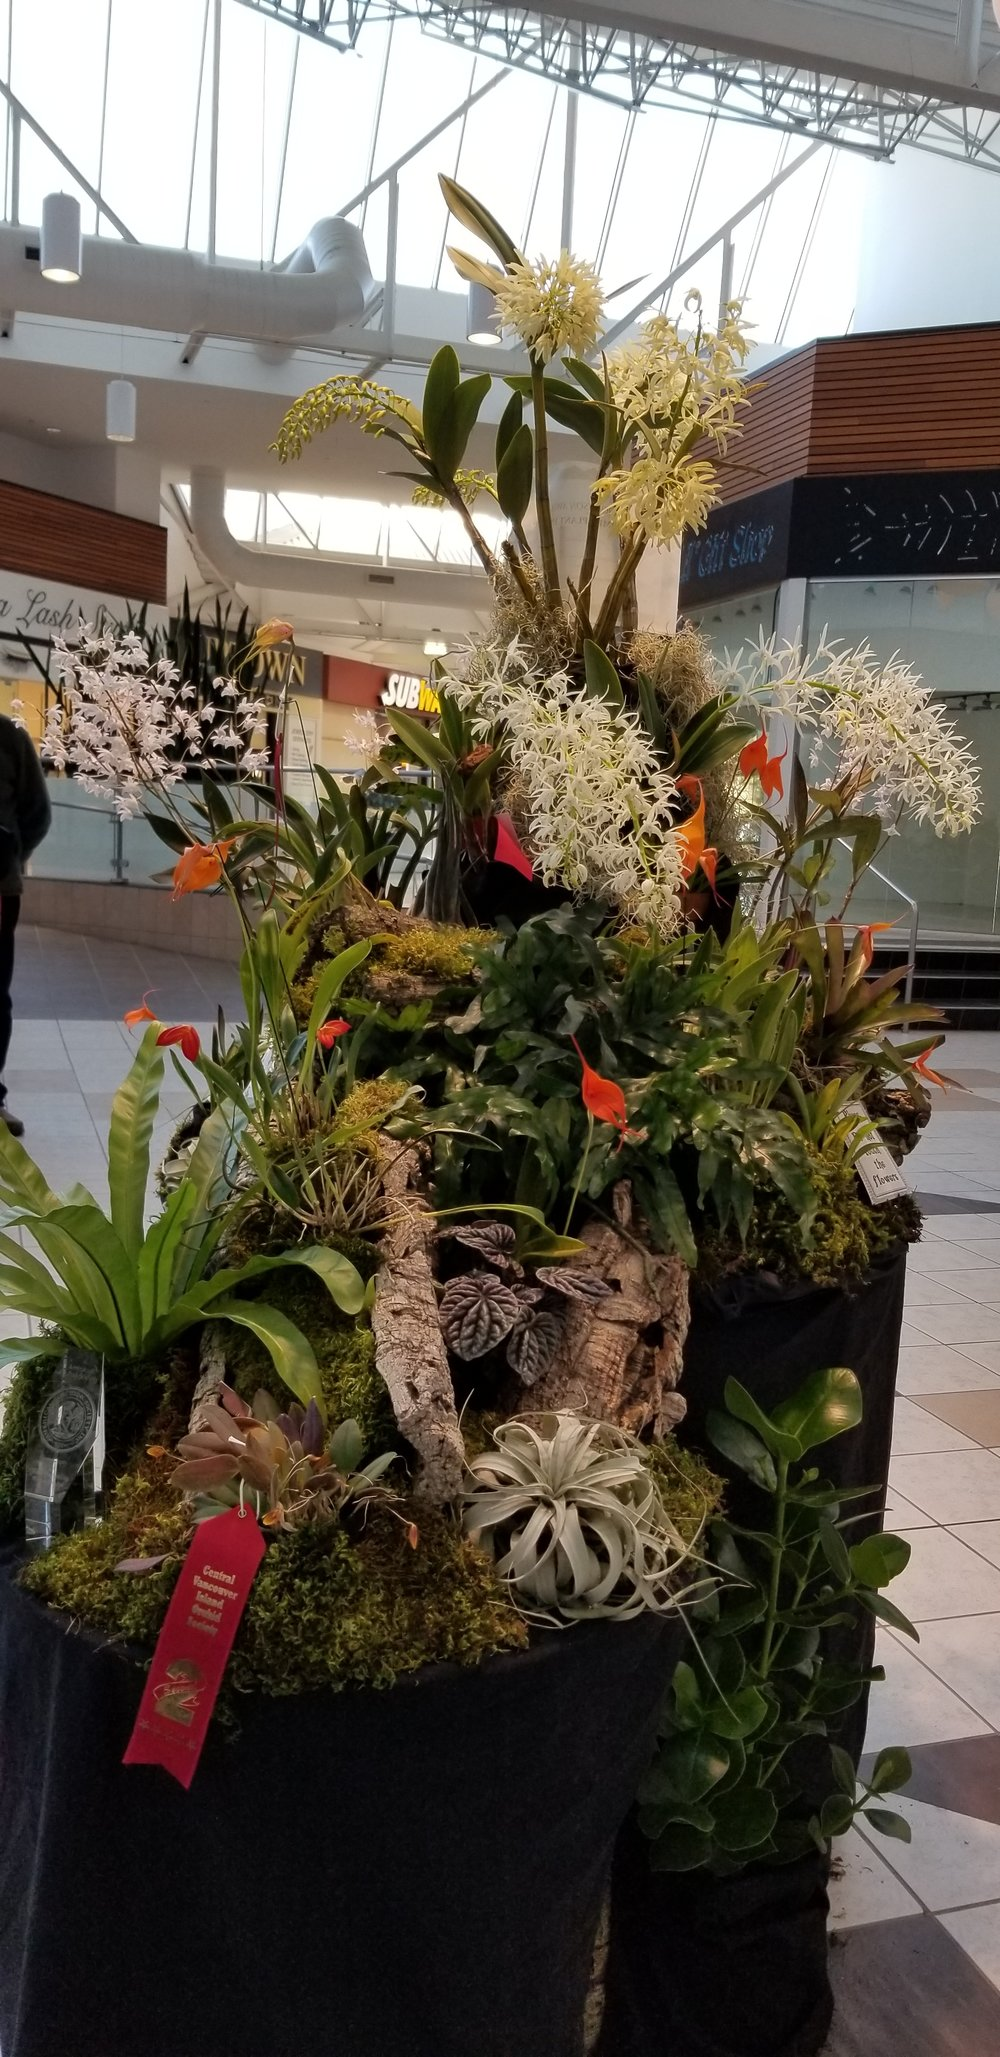 Bryan Emery's Award winning display